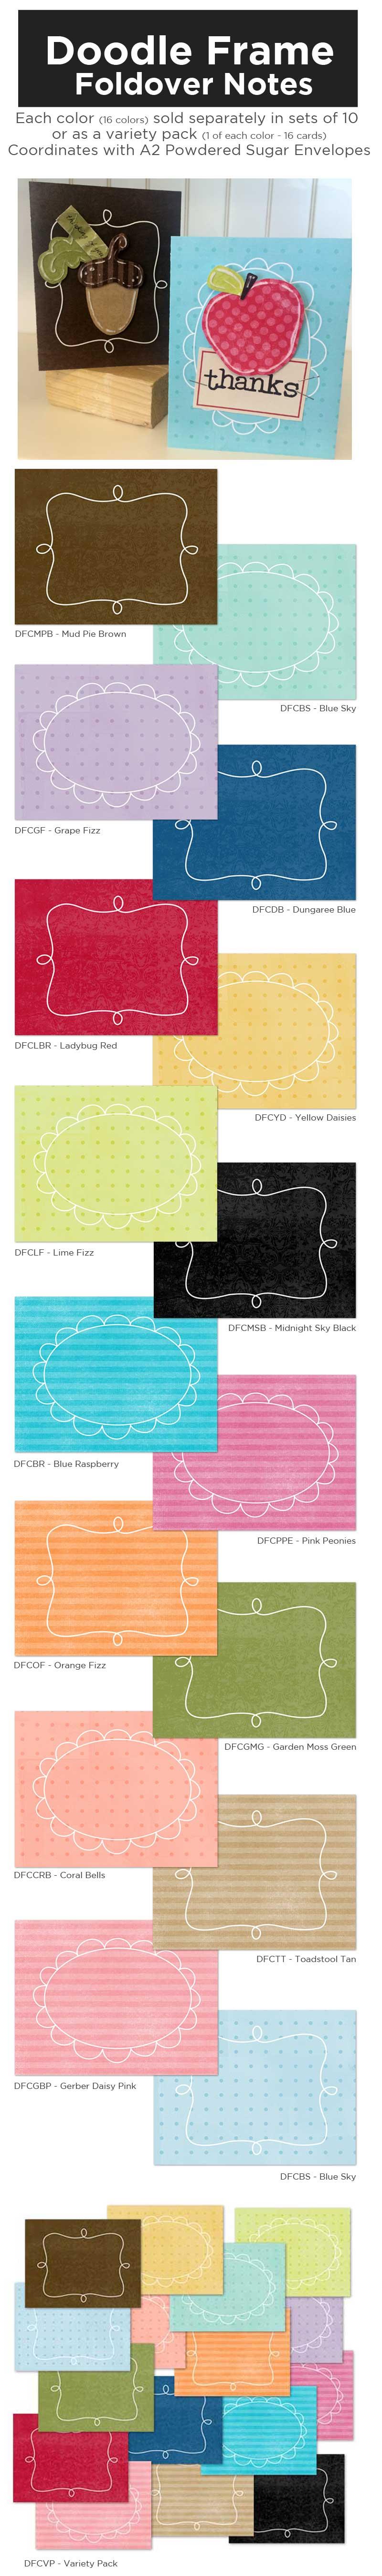 Doodle-Cards-Catalog-Online-Shop